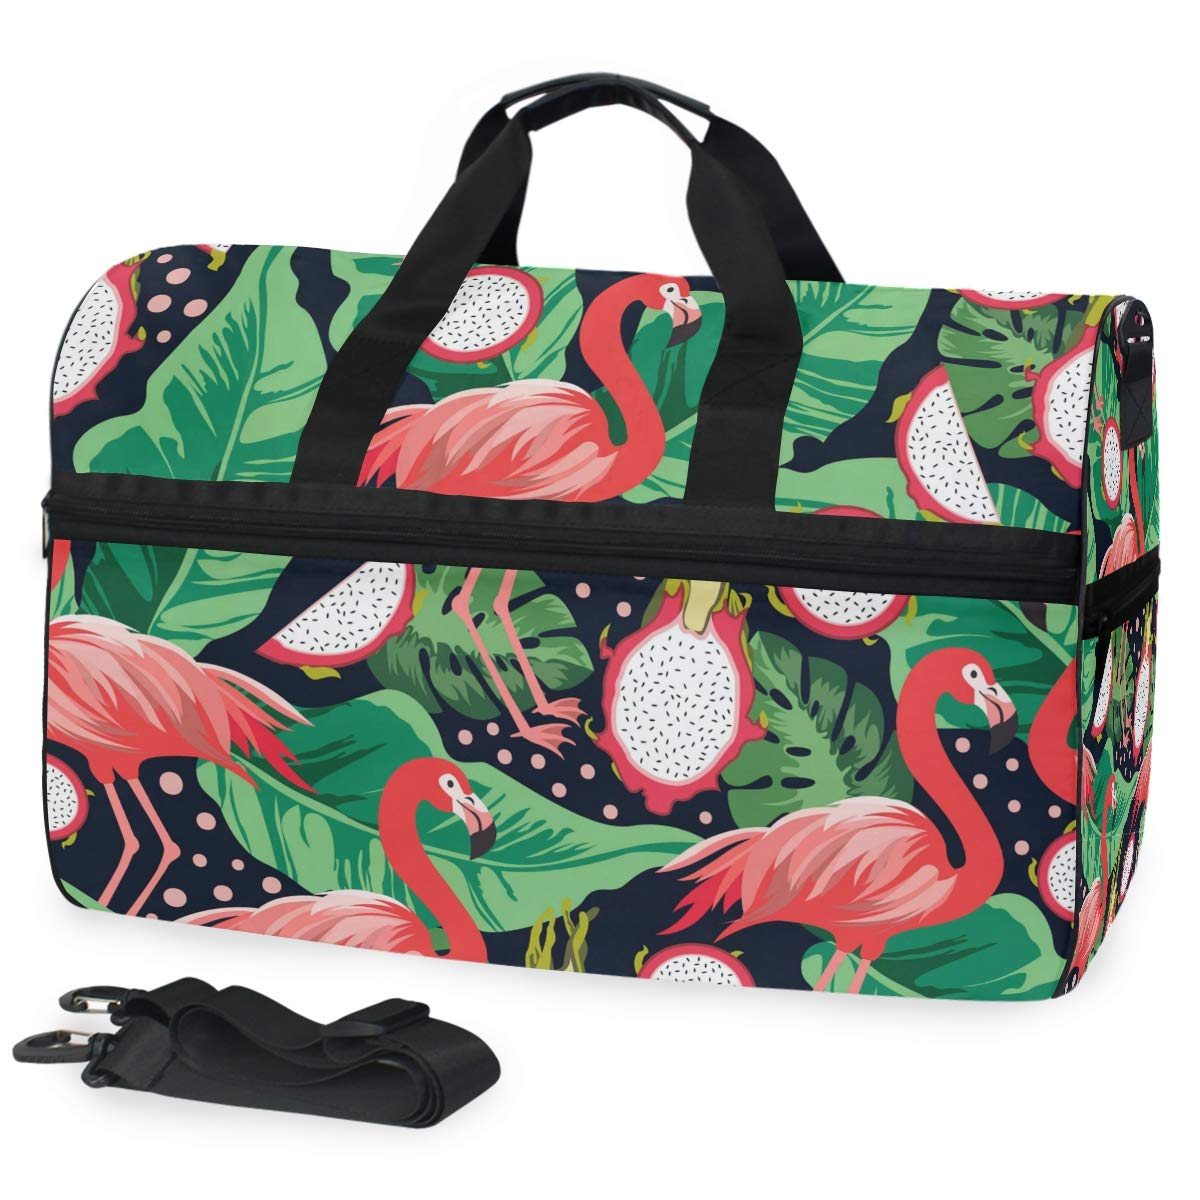 Flamingo Travel Duffel Bag Waterproof Fashion Lightweight Large Capacity Portable Luggage Bag